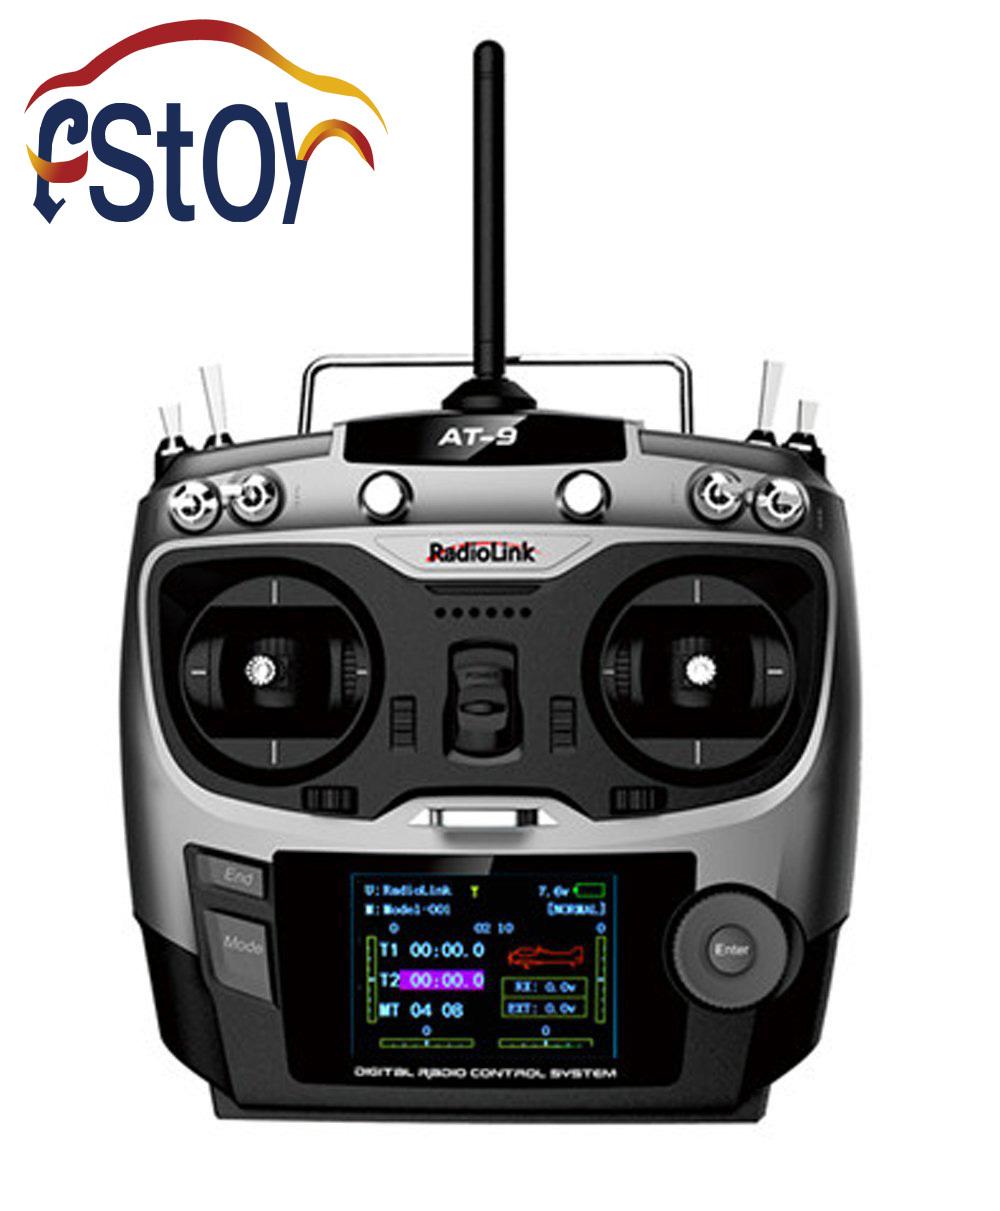 Radiolink AT9 2.4GHz 9 Channel Transmitter and Receiver ...  Radiolink AT9 2...